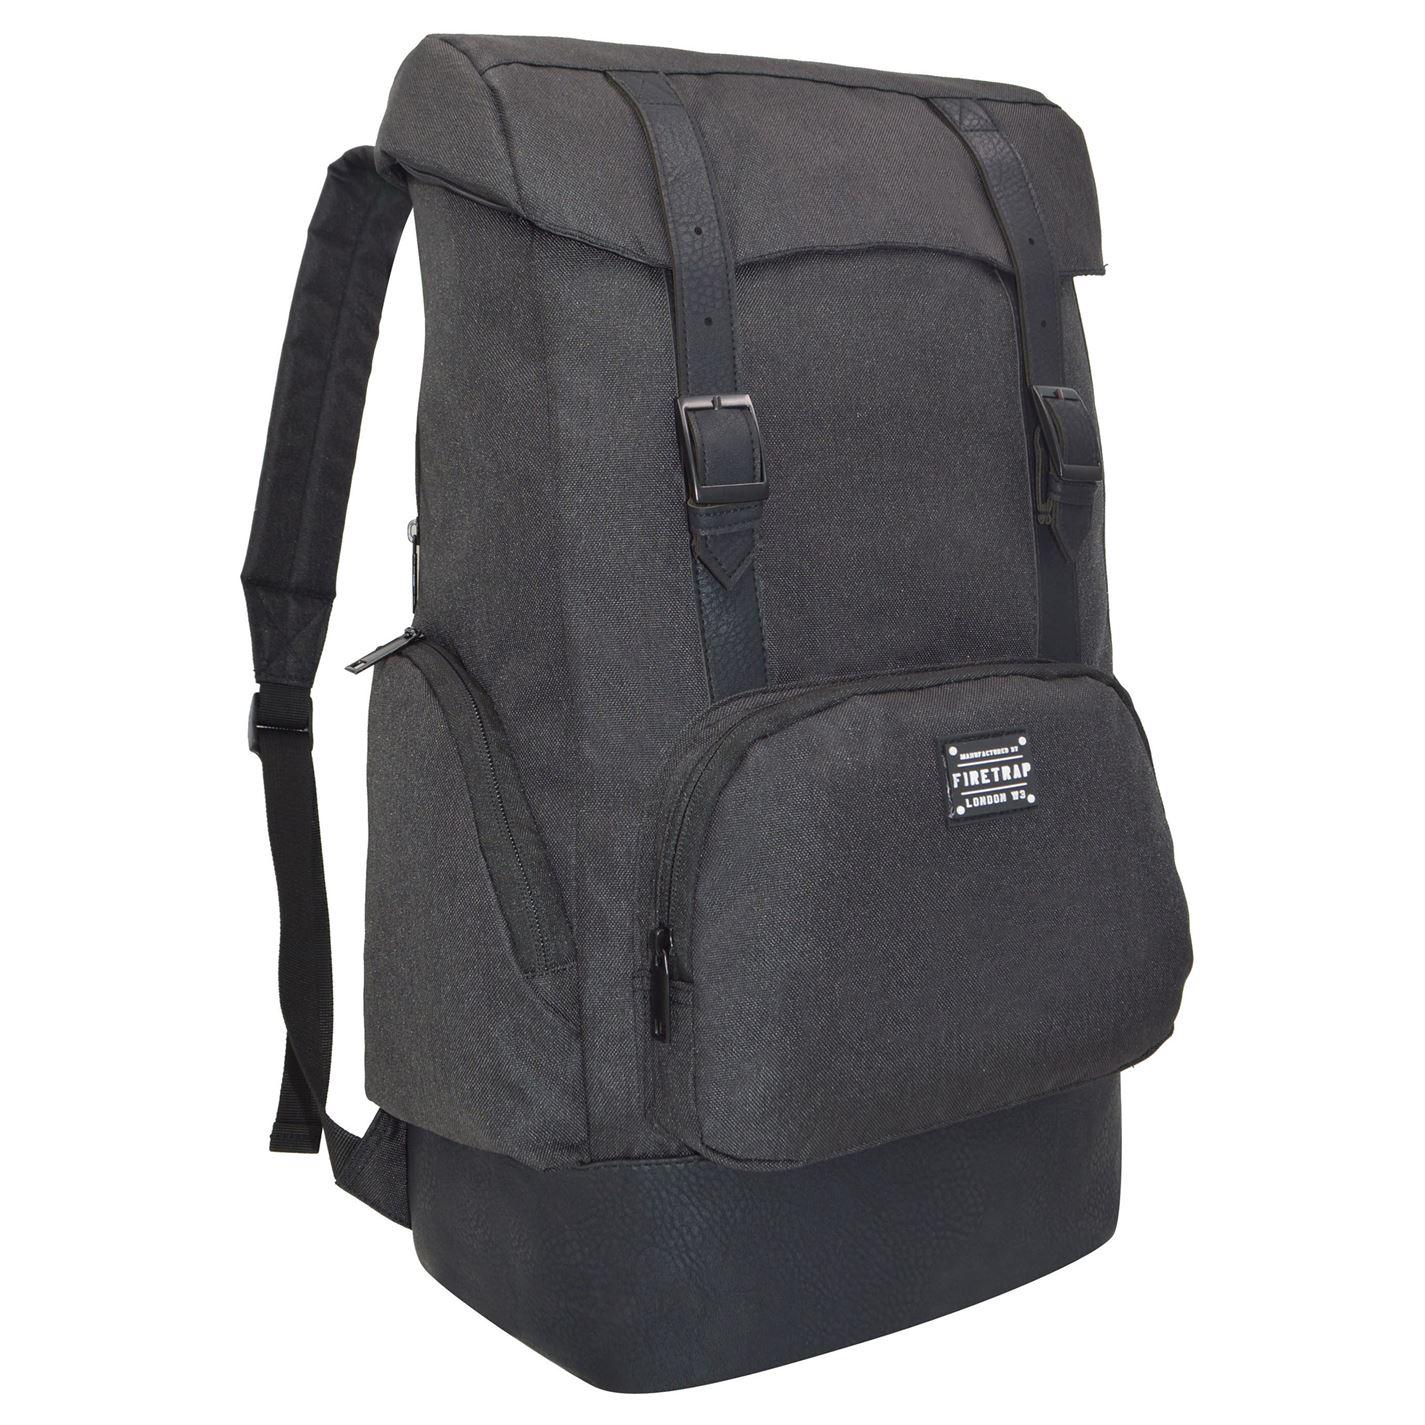 Firetrap Hike Duffel Bag